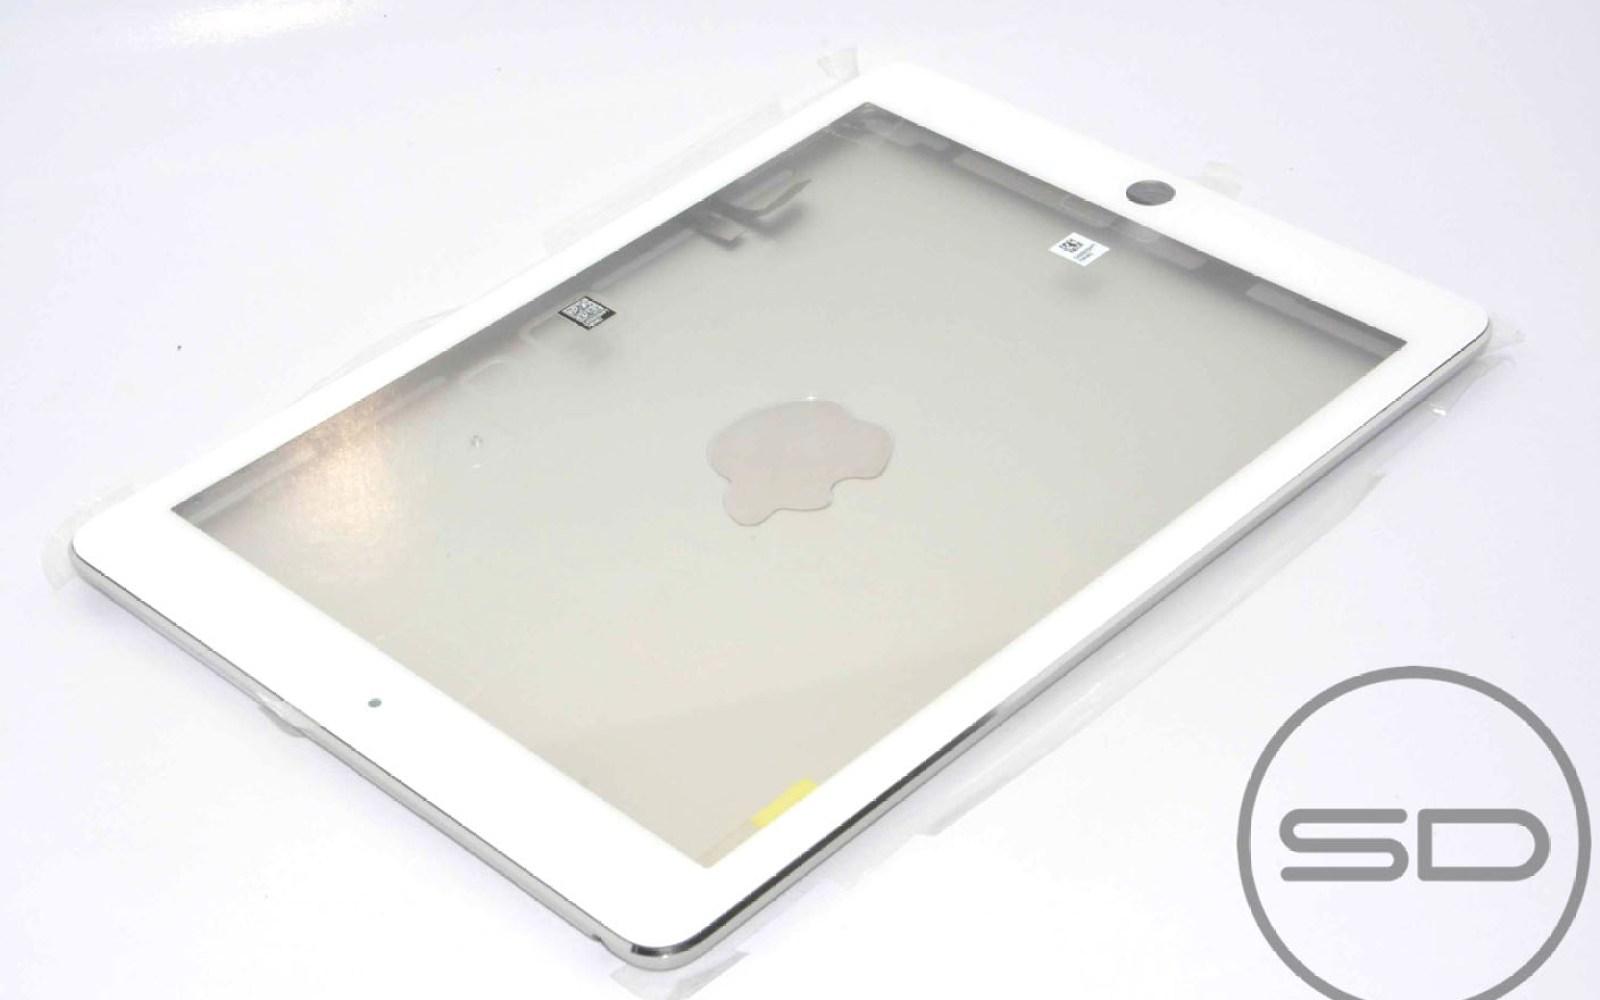 Parts leaker puts iPad 5 front panel on iPad 5 back, 1% of the way to DIY iPad